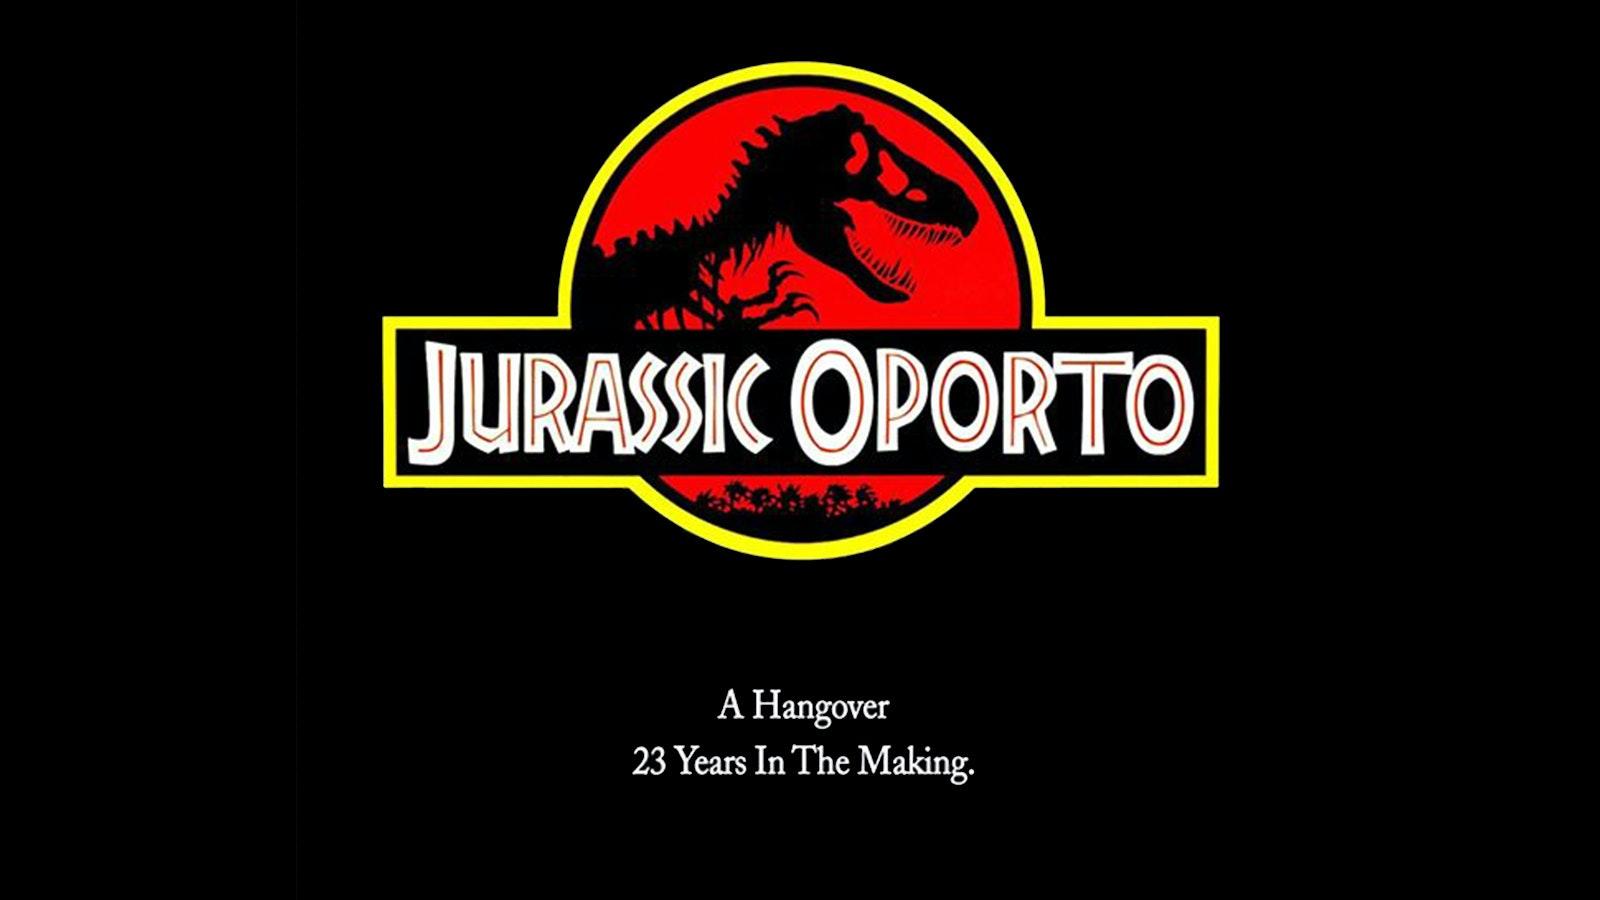 Jurassic Oporto Birthday Party!